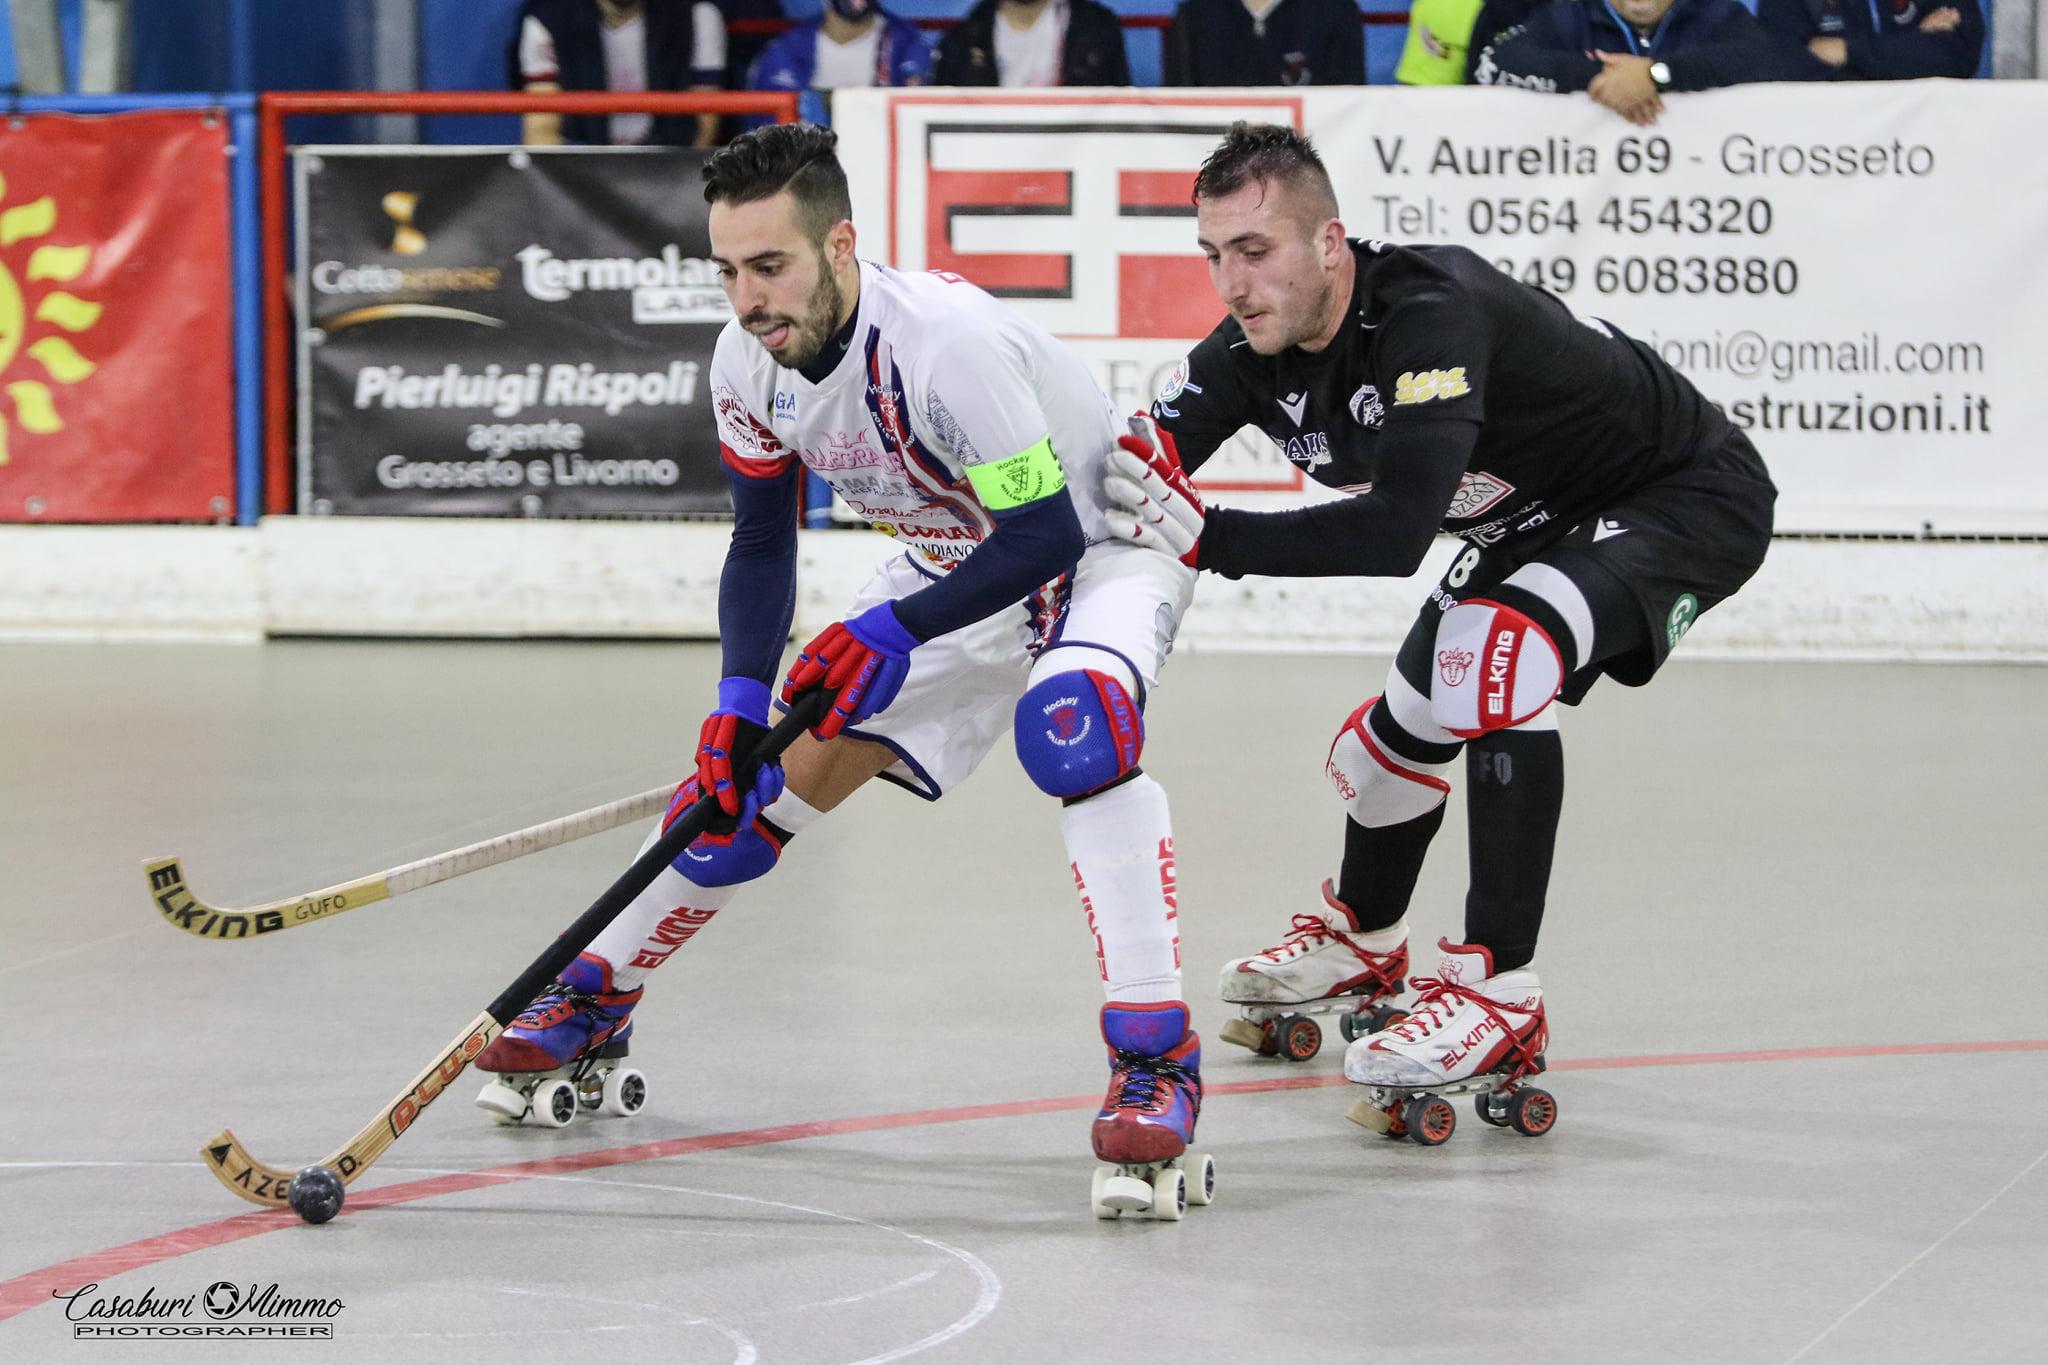 hockey-pista-circolo-pattinaotri-grosseto-Edilfox-Scandiano-Franchi-stefano-Paghi